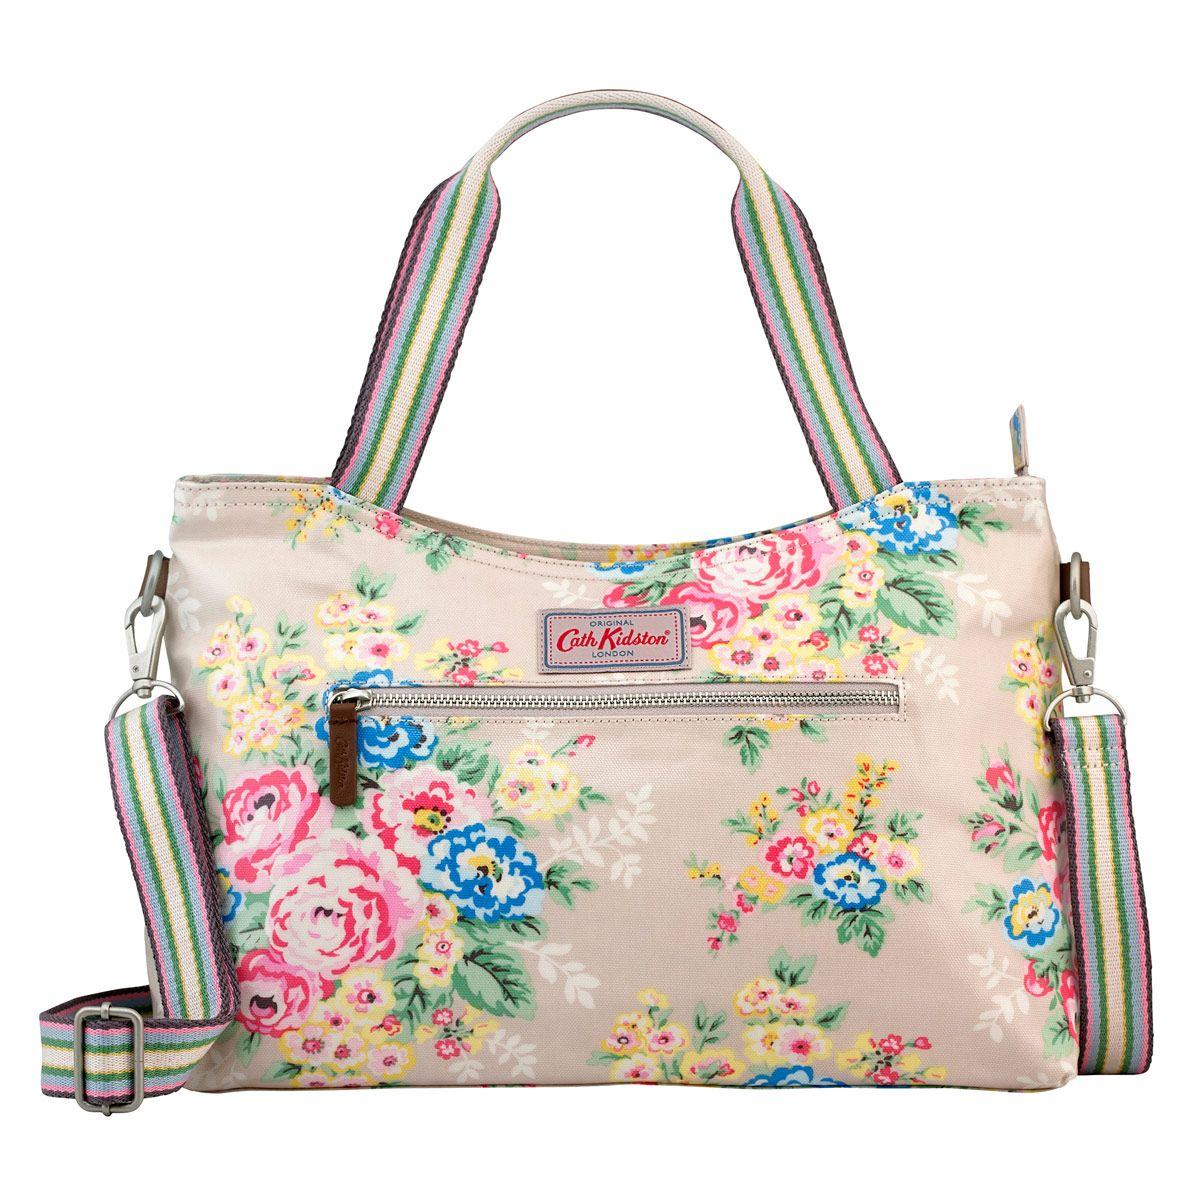 Kleding en accessoires Cath Kidston CAT & FLOWERS LARGE TOTE BAG Brand New Limited Stock